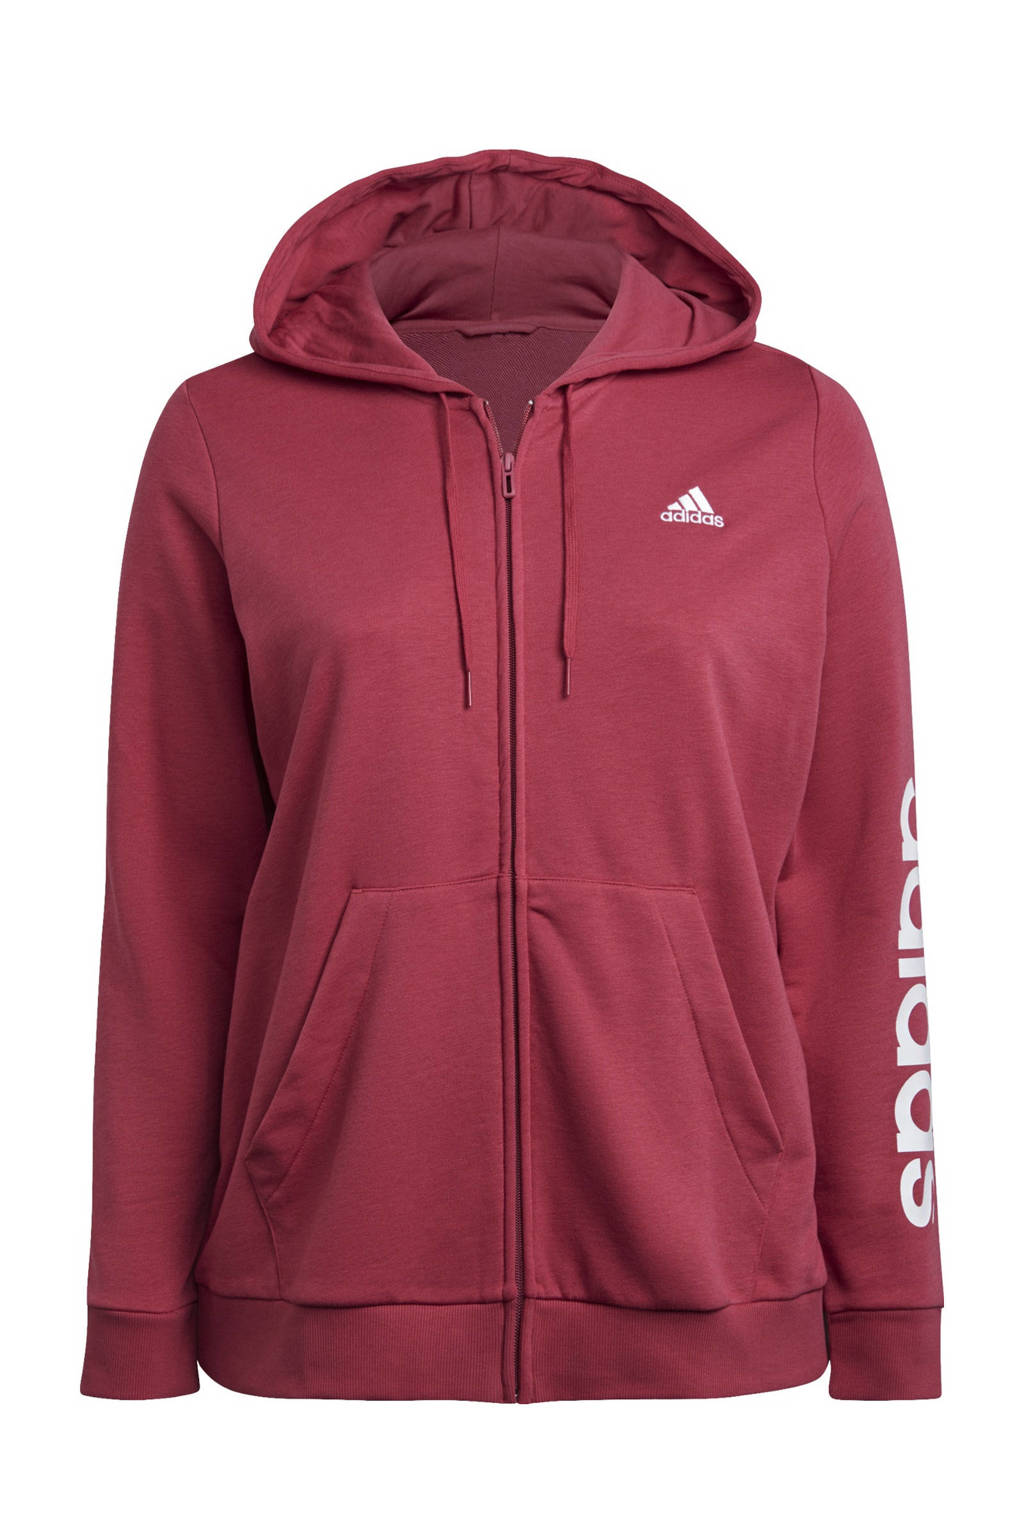 adidas Performance Plus Size sportvest donkerroze/wit, Donkerroze/wit